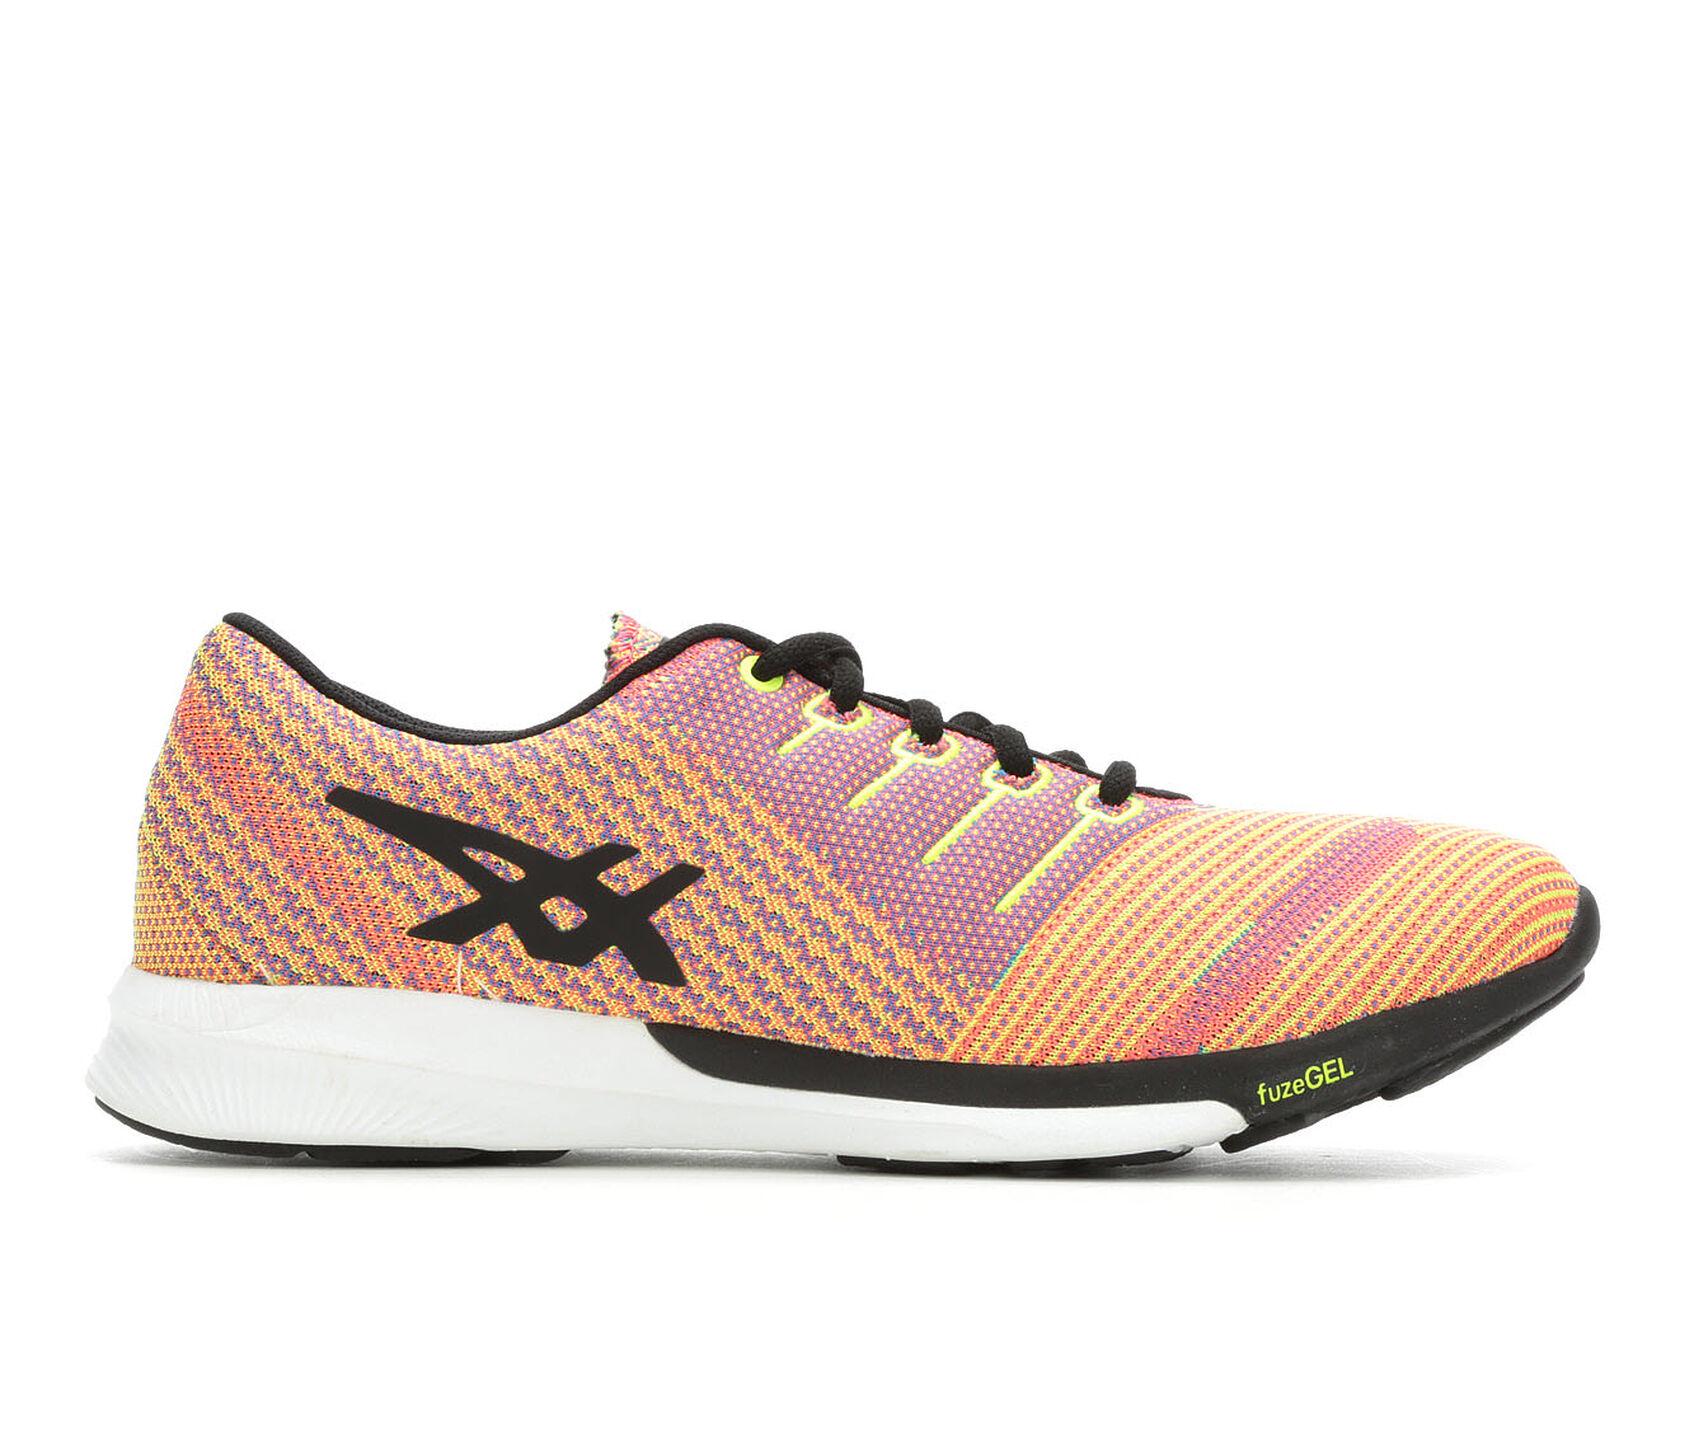 ae496d6de54 Women s ASICS Fuzex Knit Running Shoes